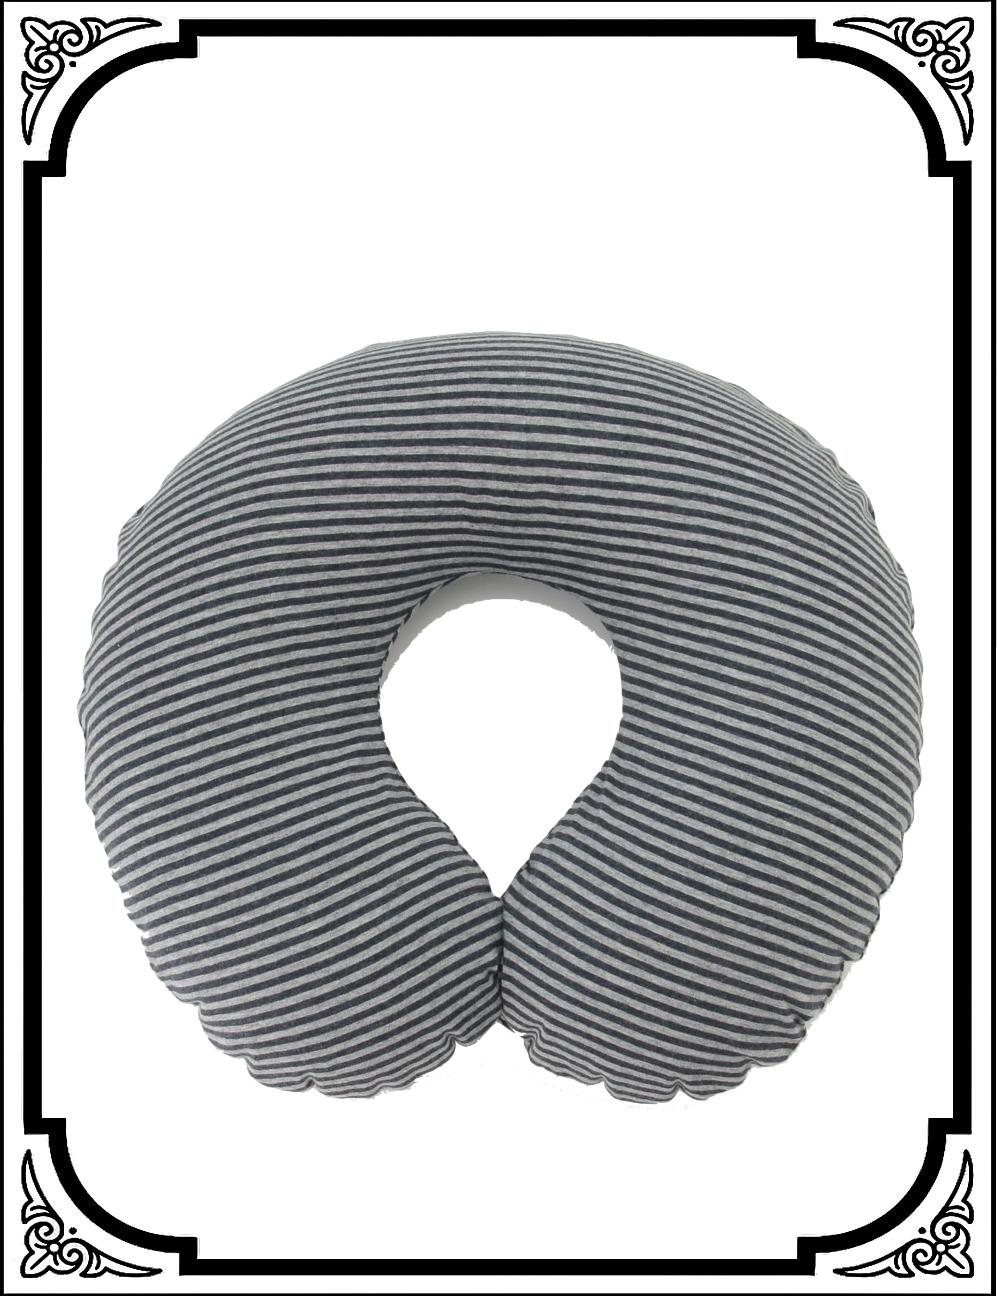 muji-neck-pillow.jpg